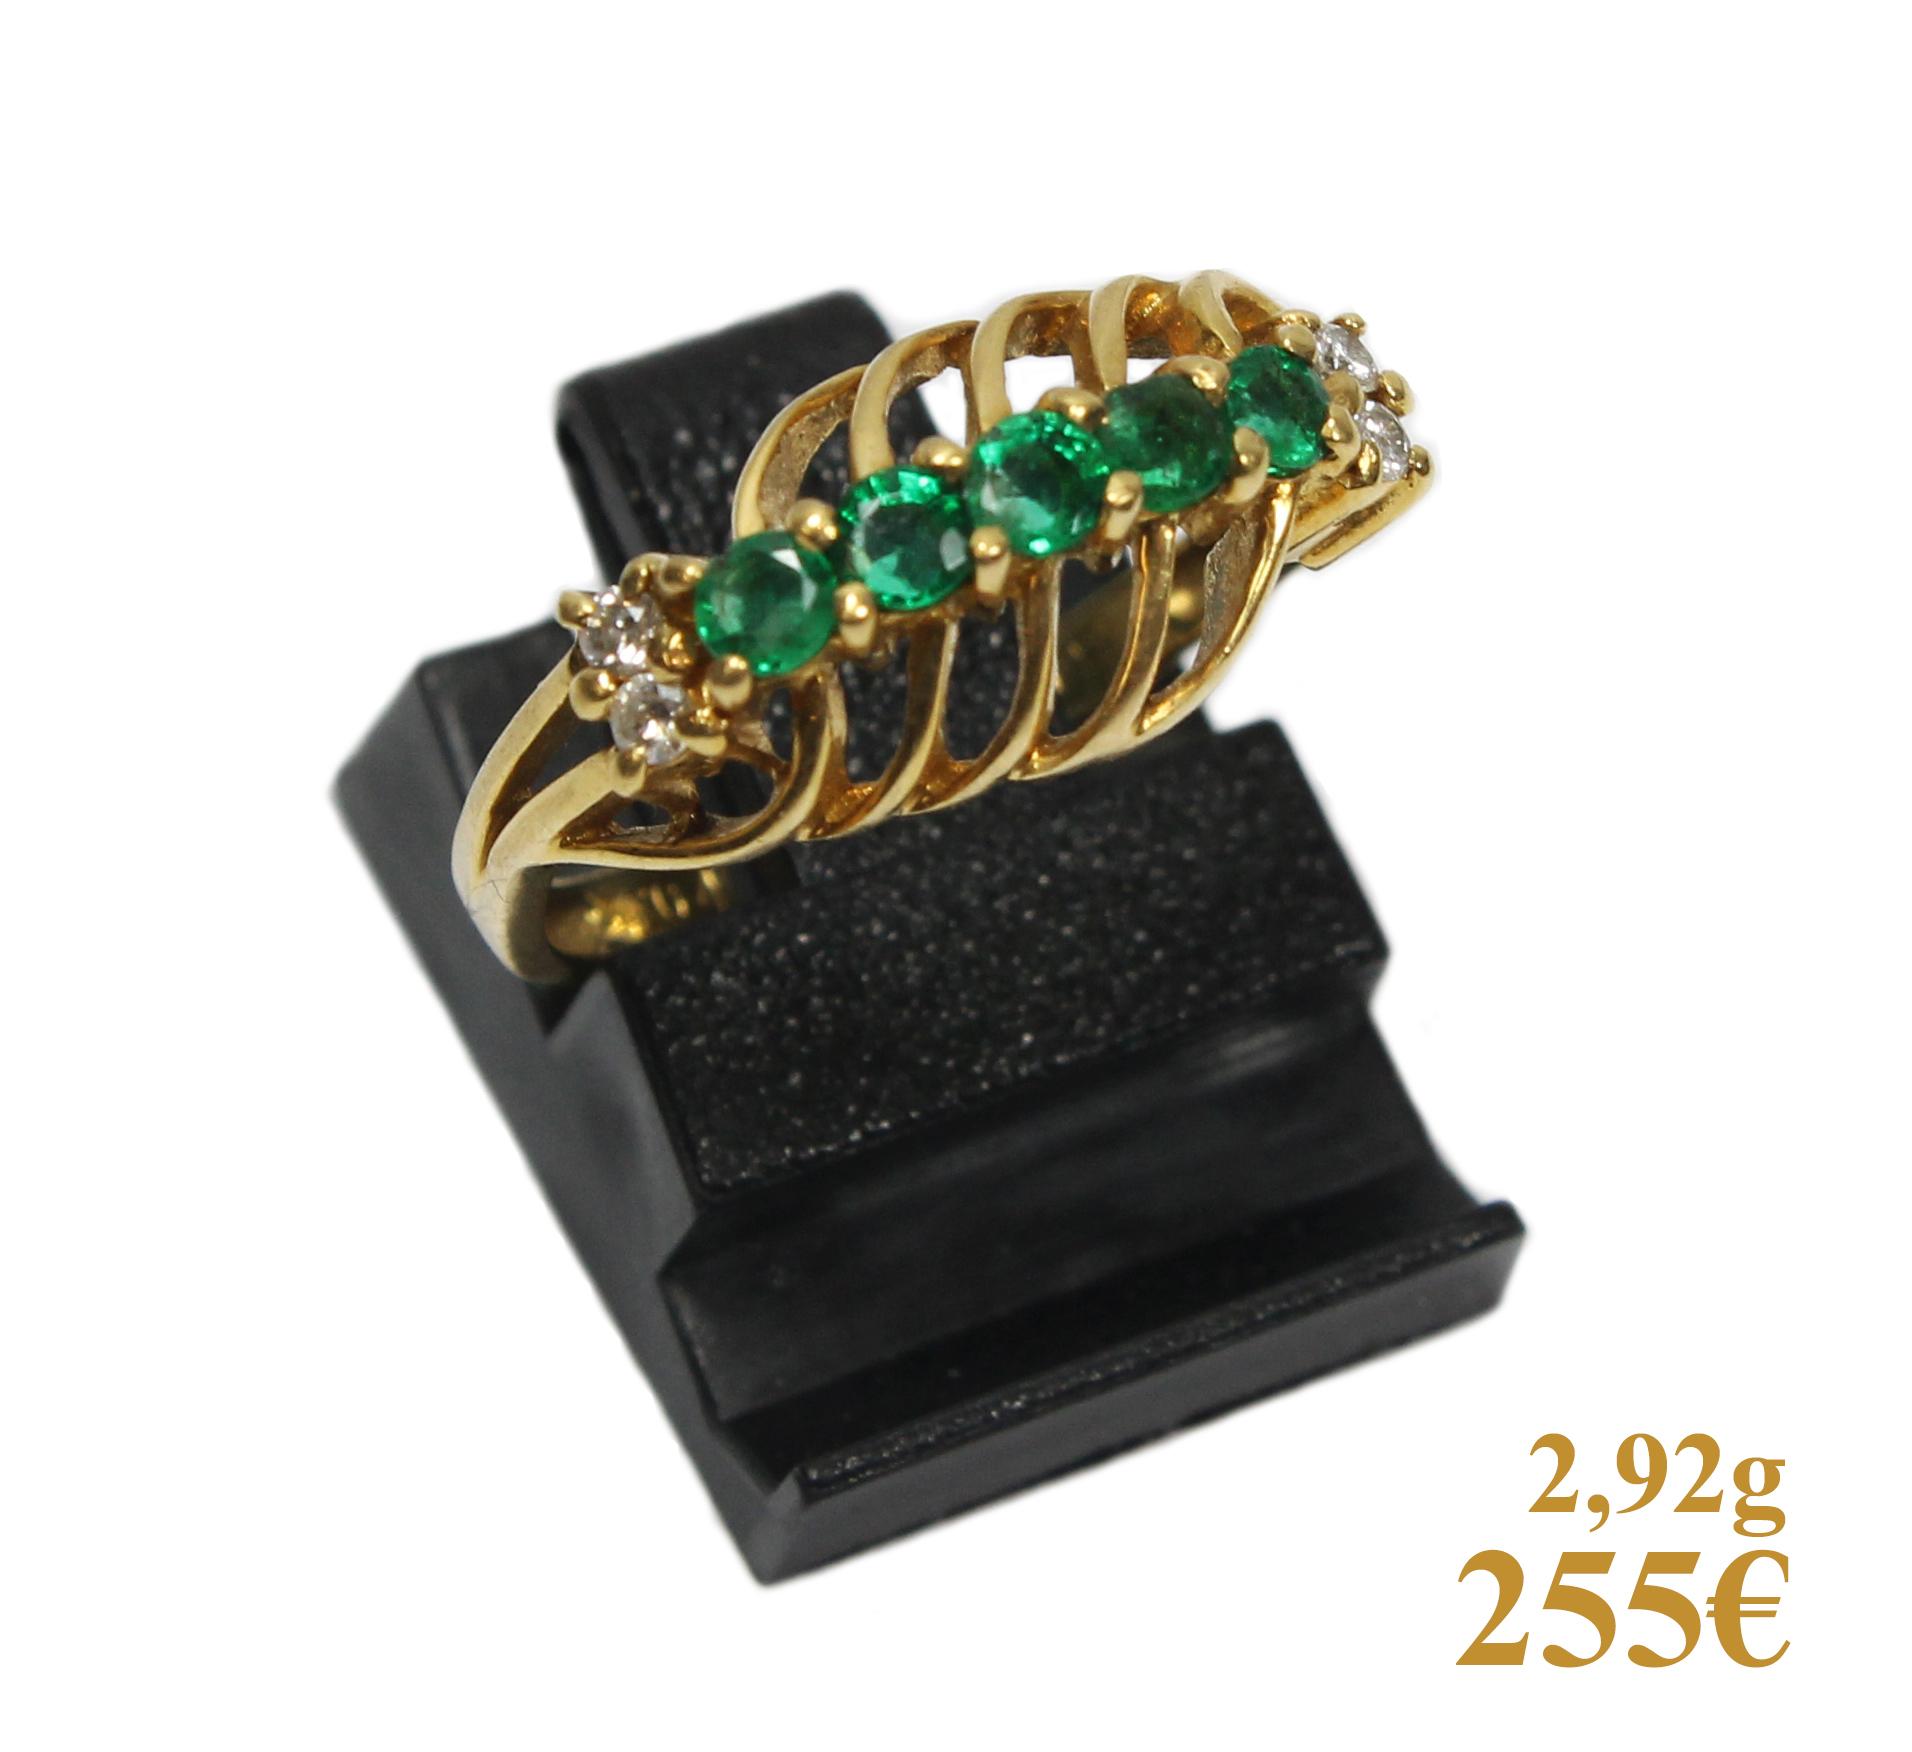 BagueEmeuDia-255e-2,92g-3876